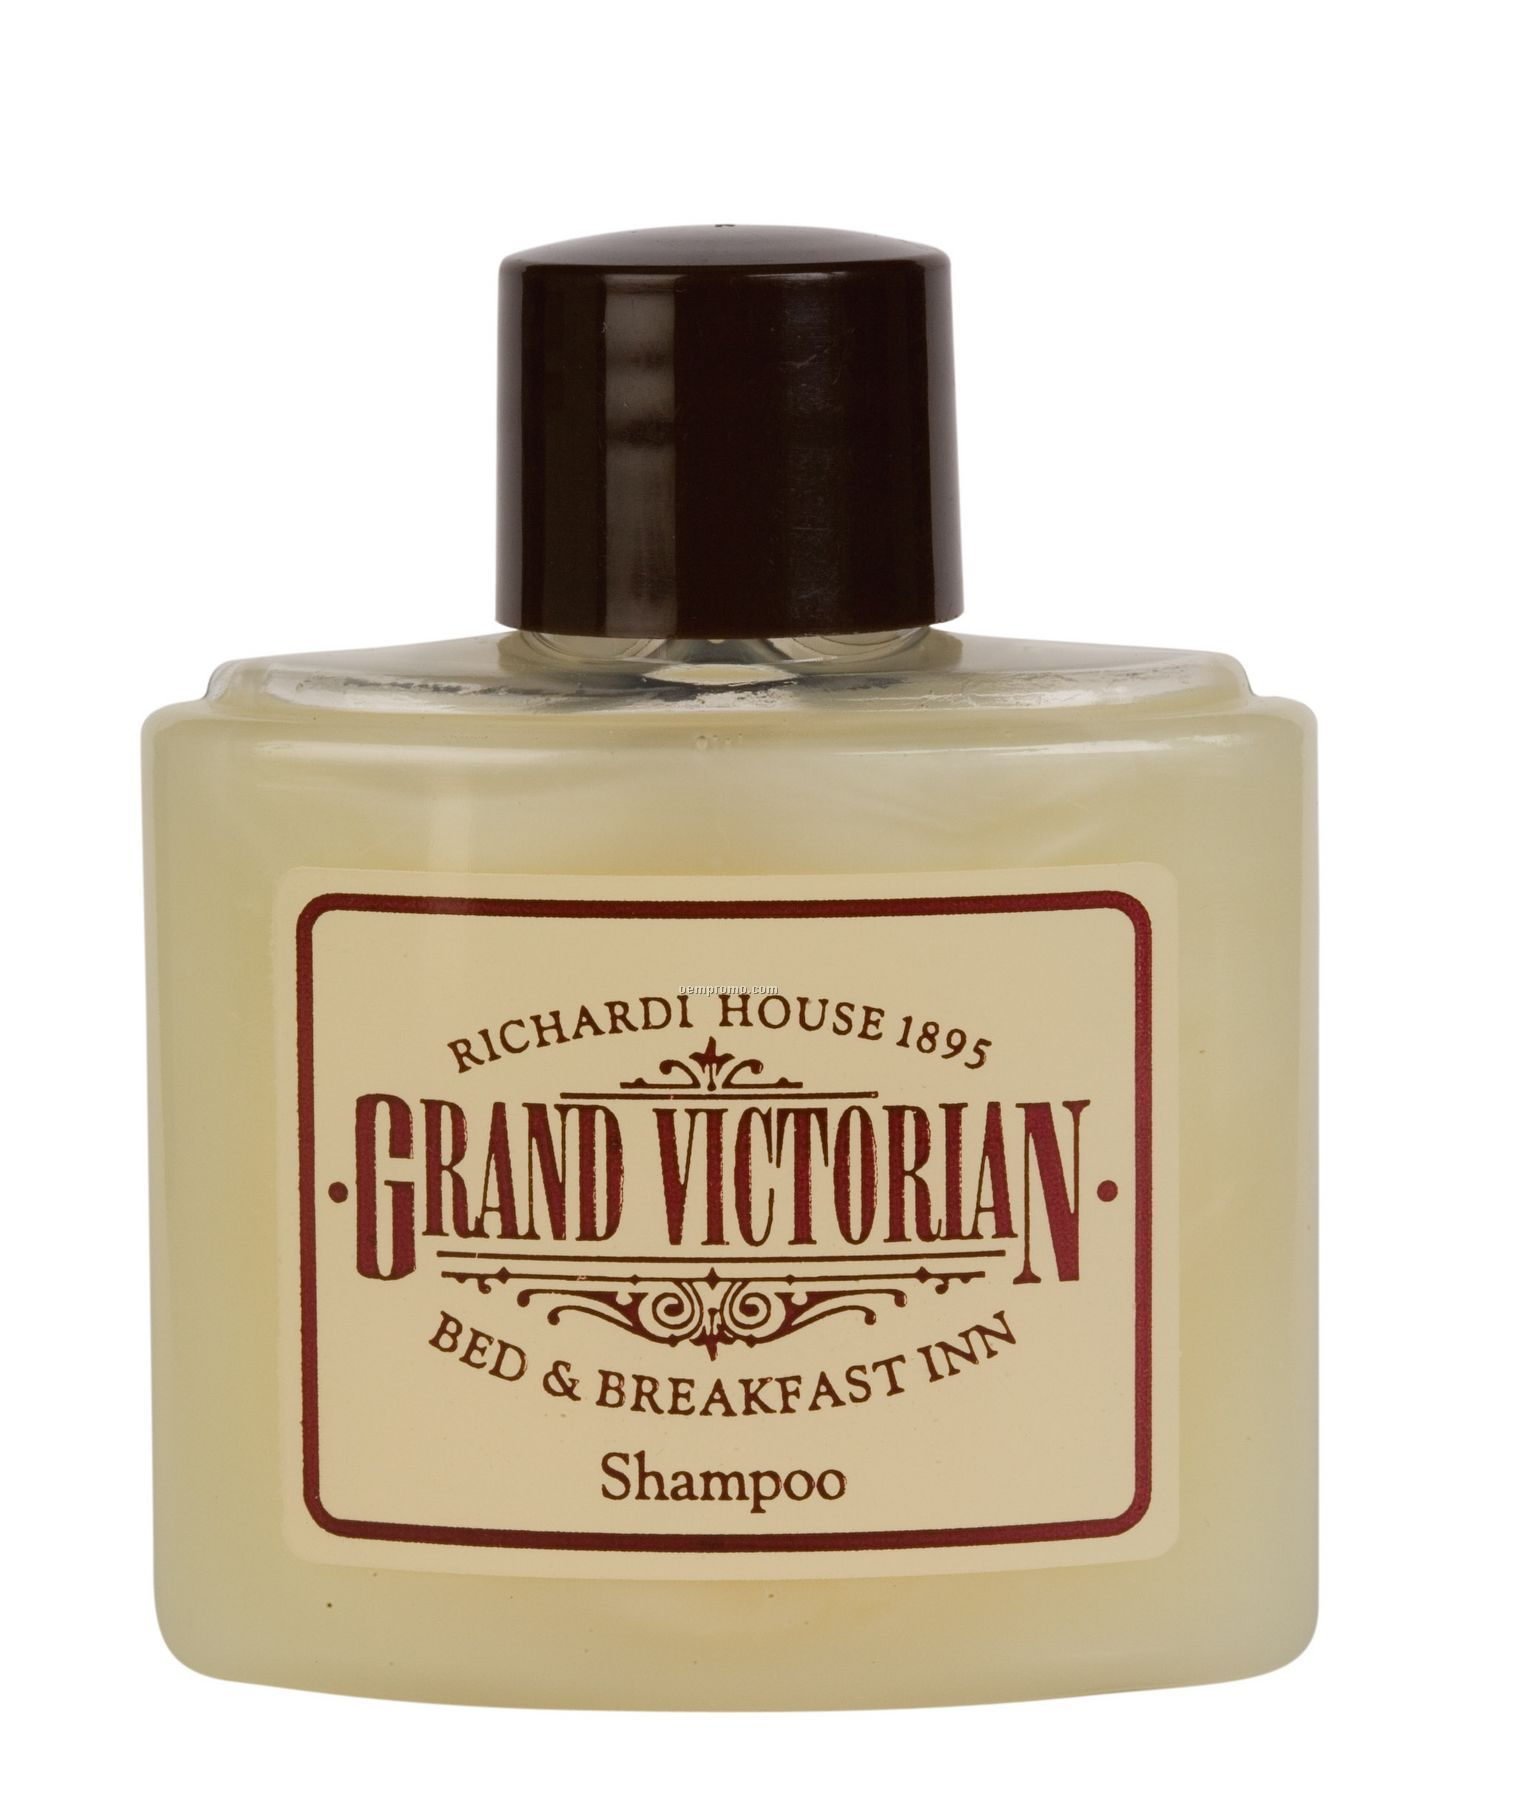 Pro Quality Shampoo 1 1/2 Oz. Wide Oval Bottle